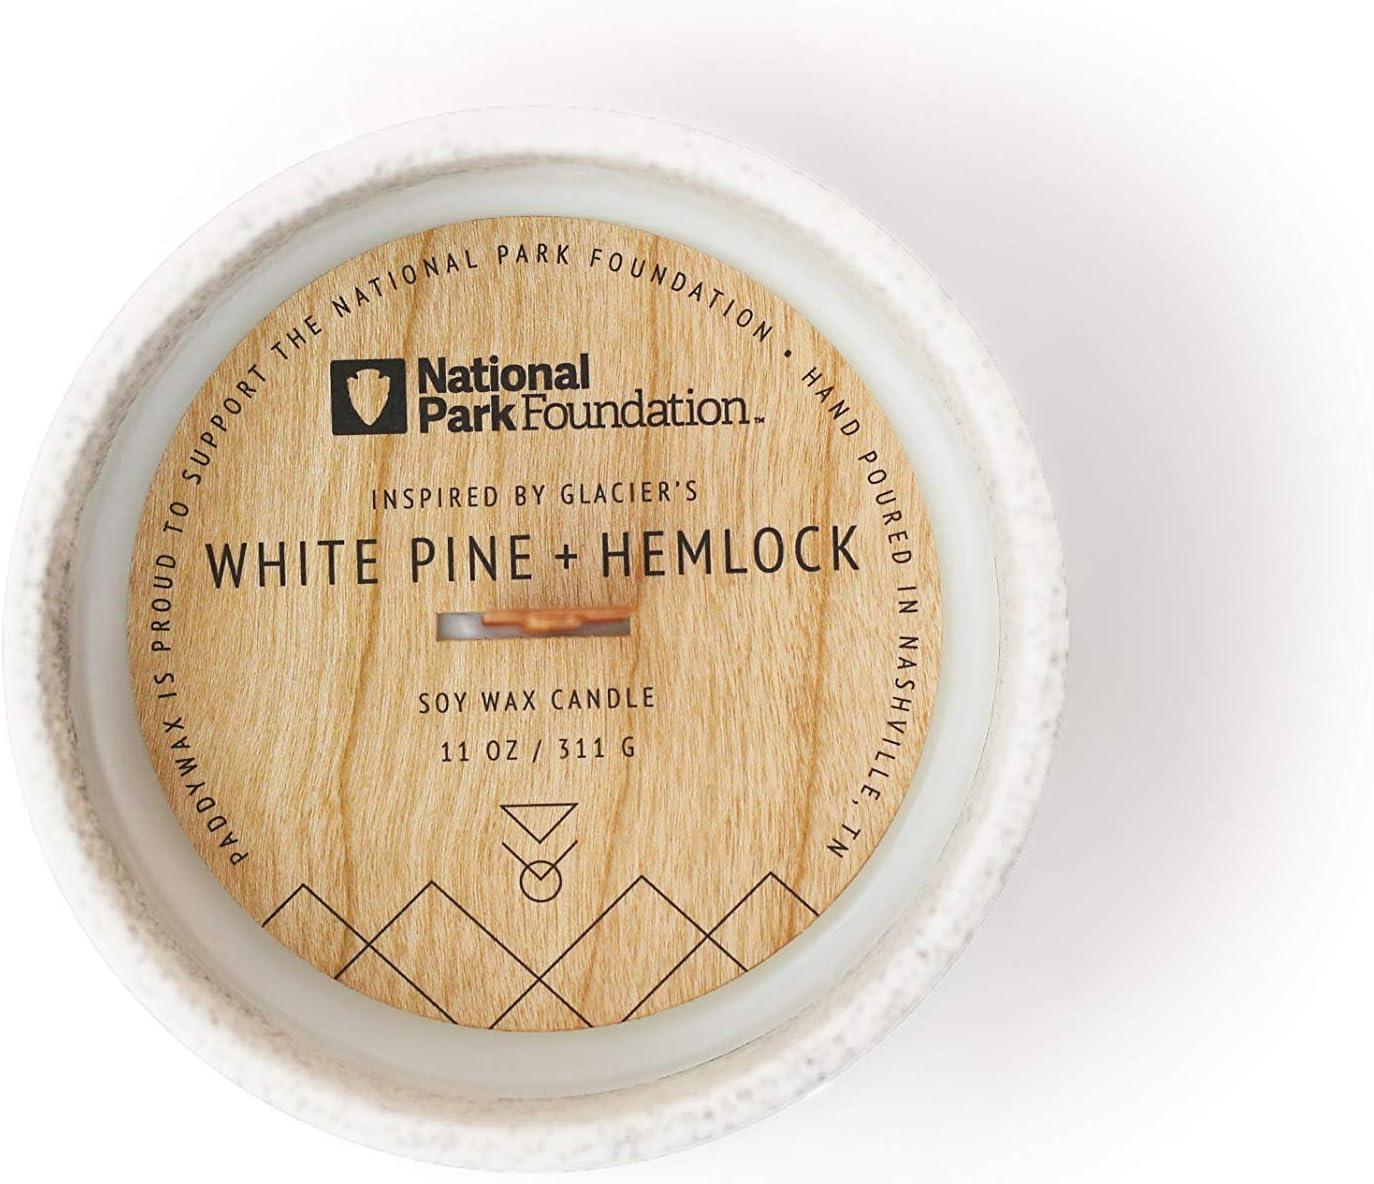 Vela arom/ática de higo y cedro Paddywax aroma a higo, 5 onzas